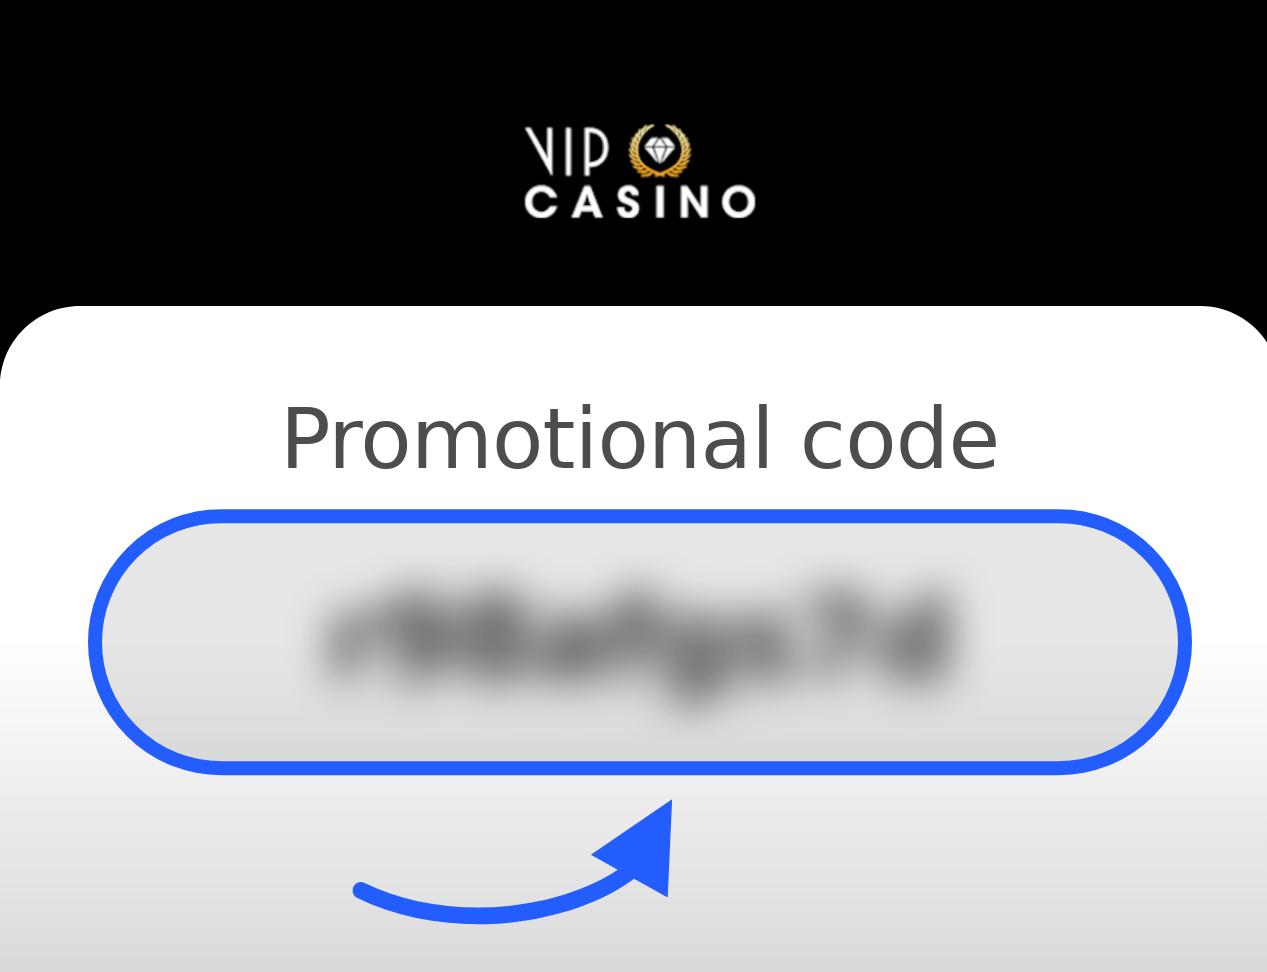 VIP Casino Promotional Code